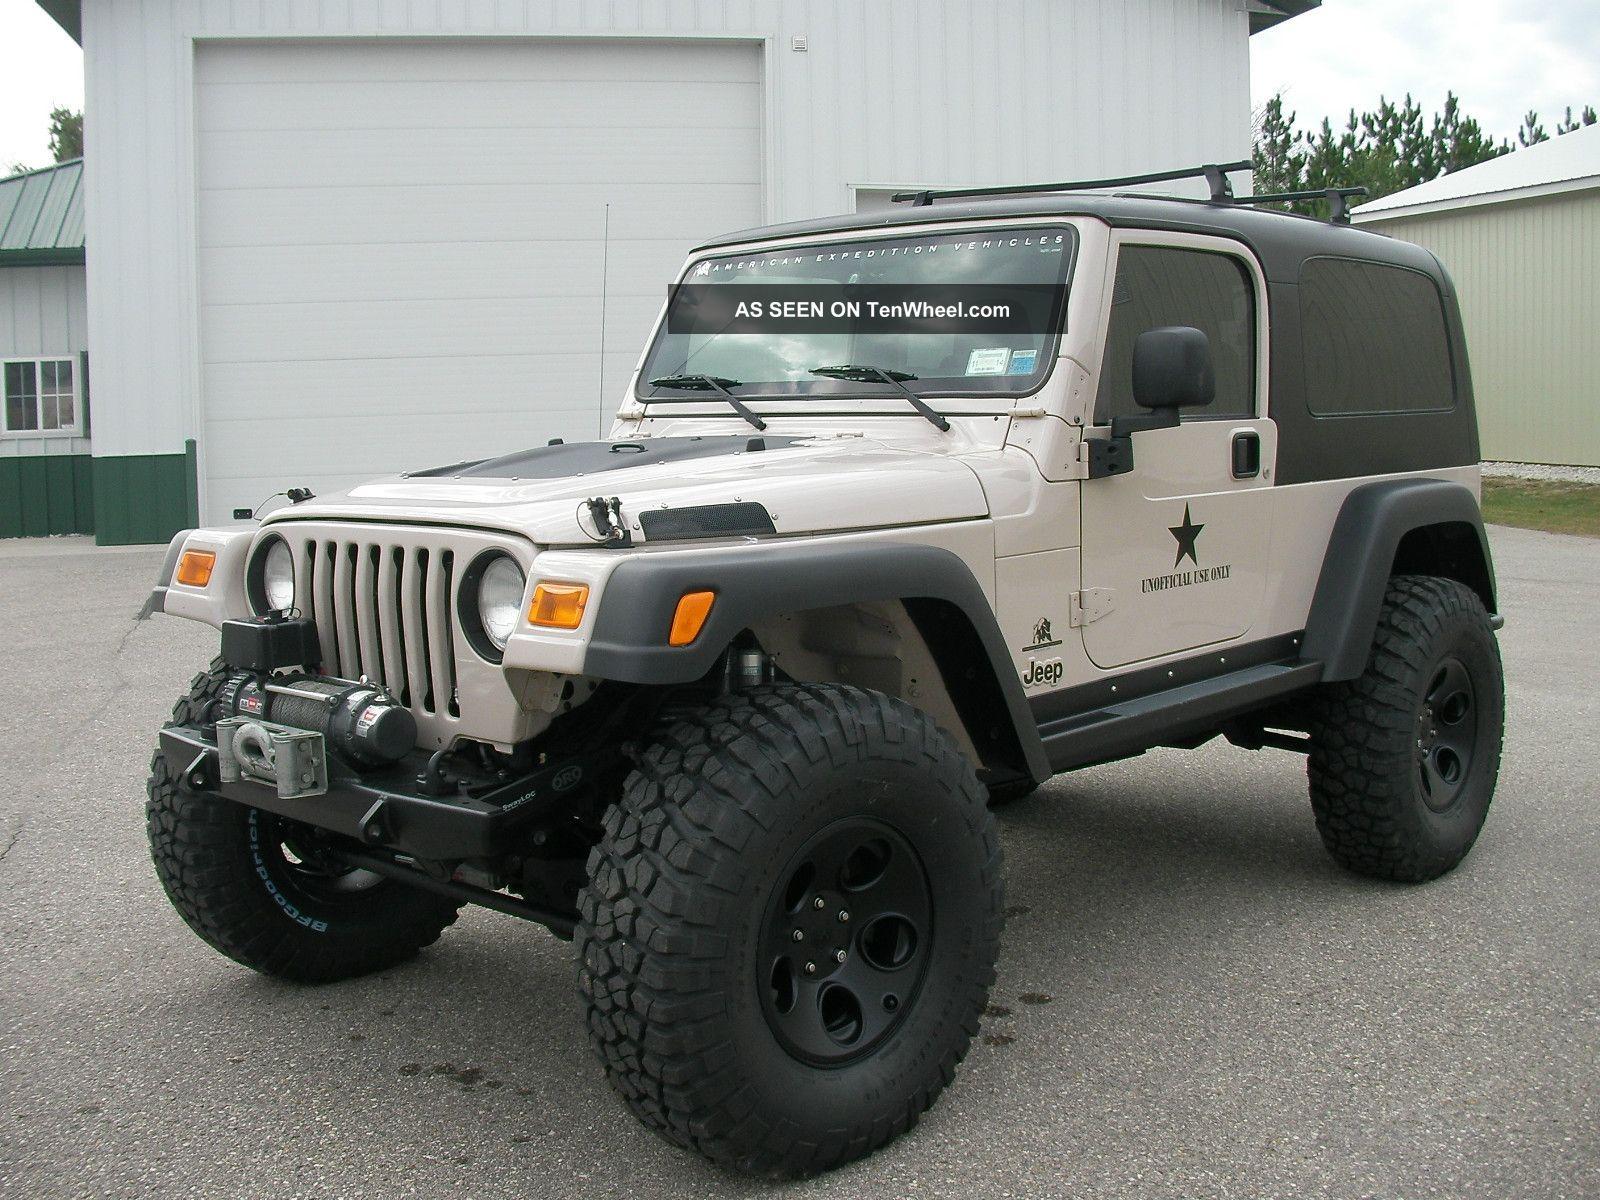 2005 jeep wrangler unlimited rubicon w 5 7 hemi. Black Bedroom Furniture Sets. Home Design Ideas